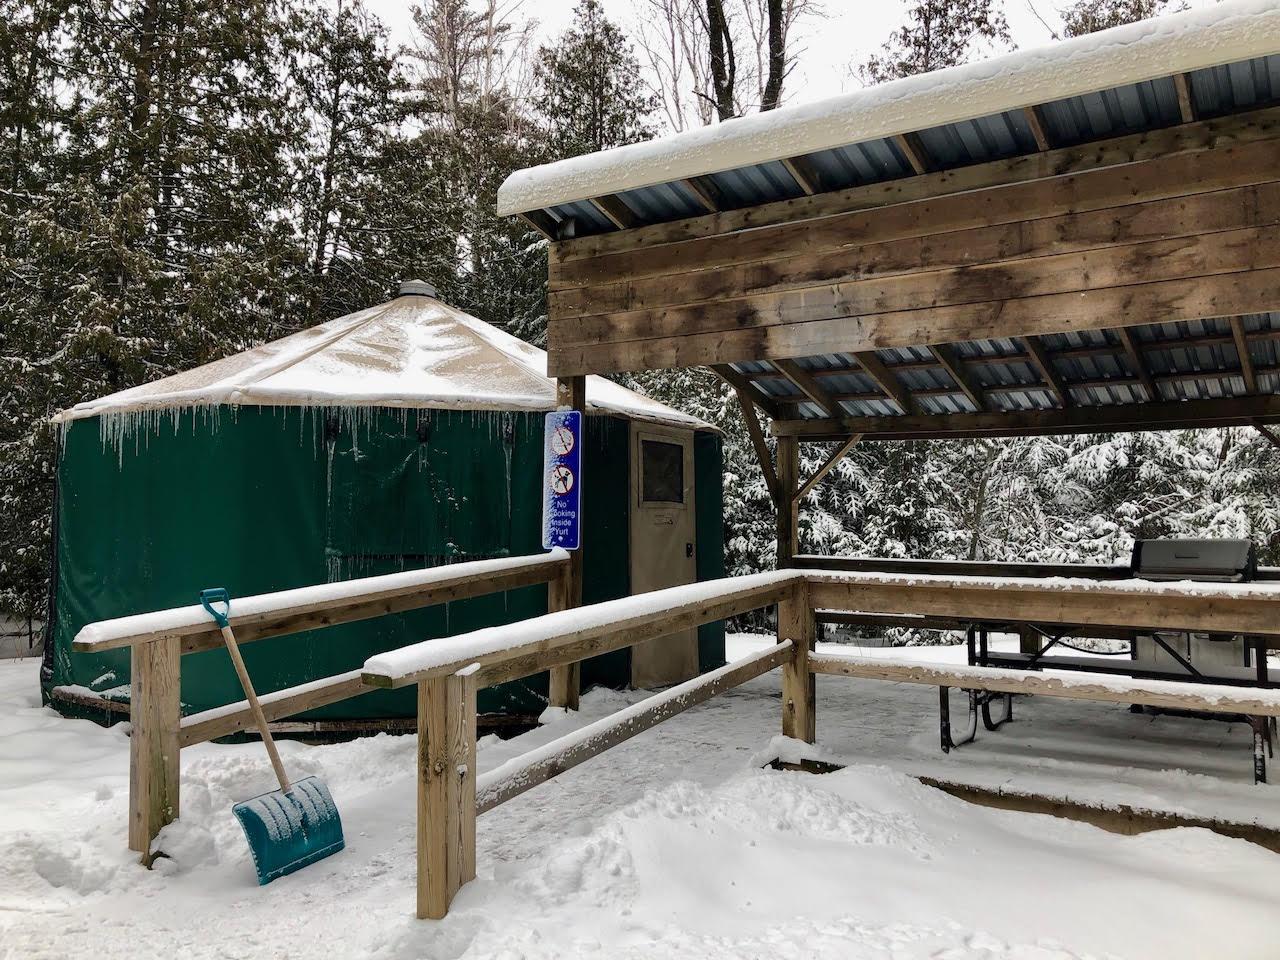 MacGregor Provincial Park winter camping